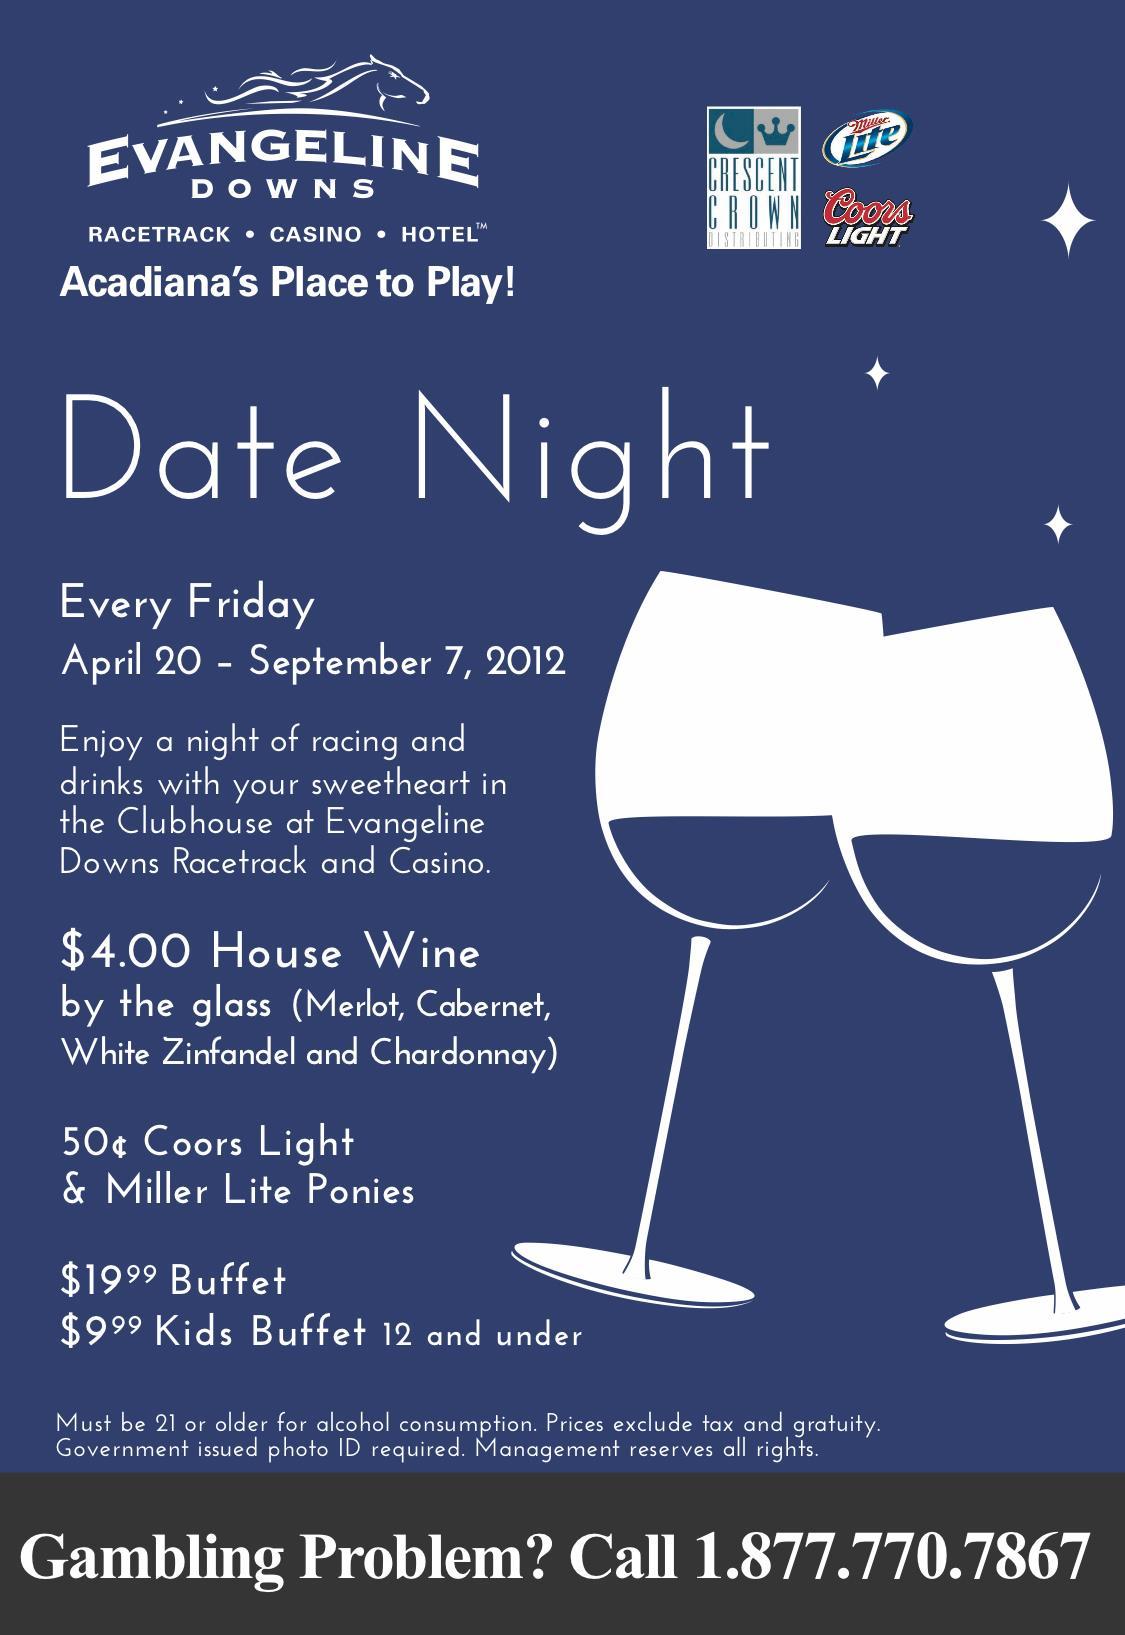 Date Night at Evangeline Downs